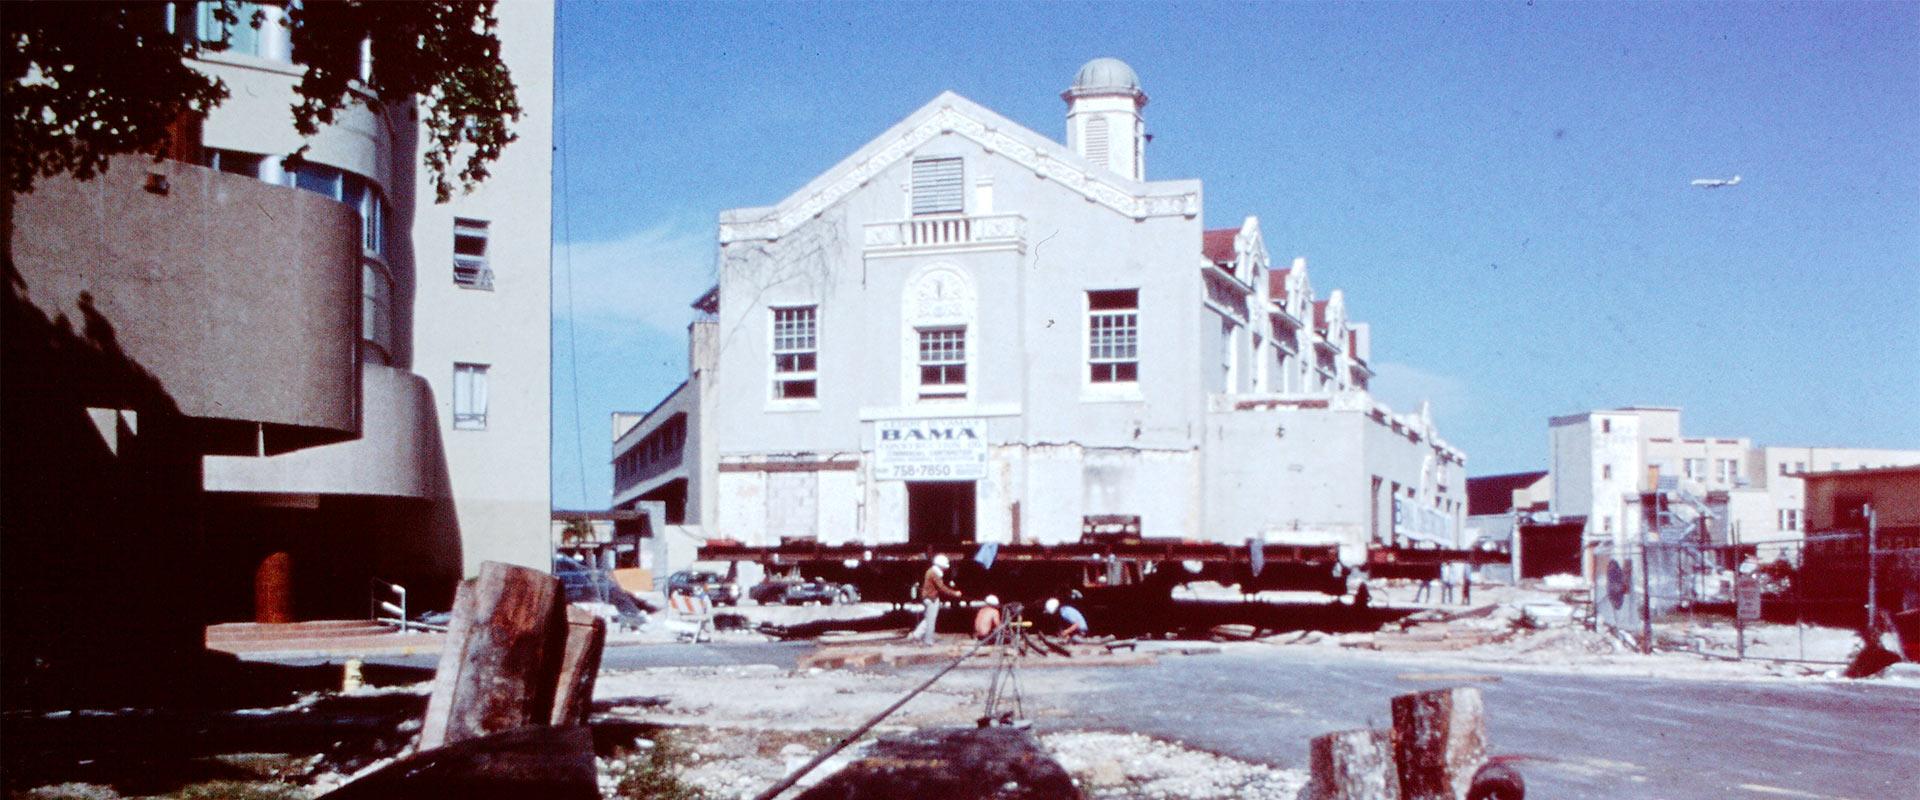 Jackson Memorial Hospital Alamo in 1979